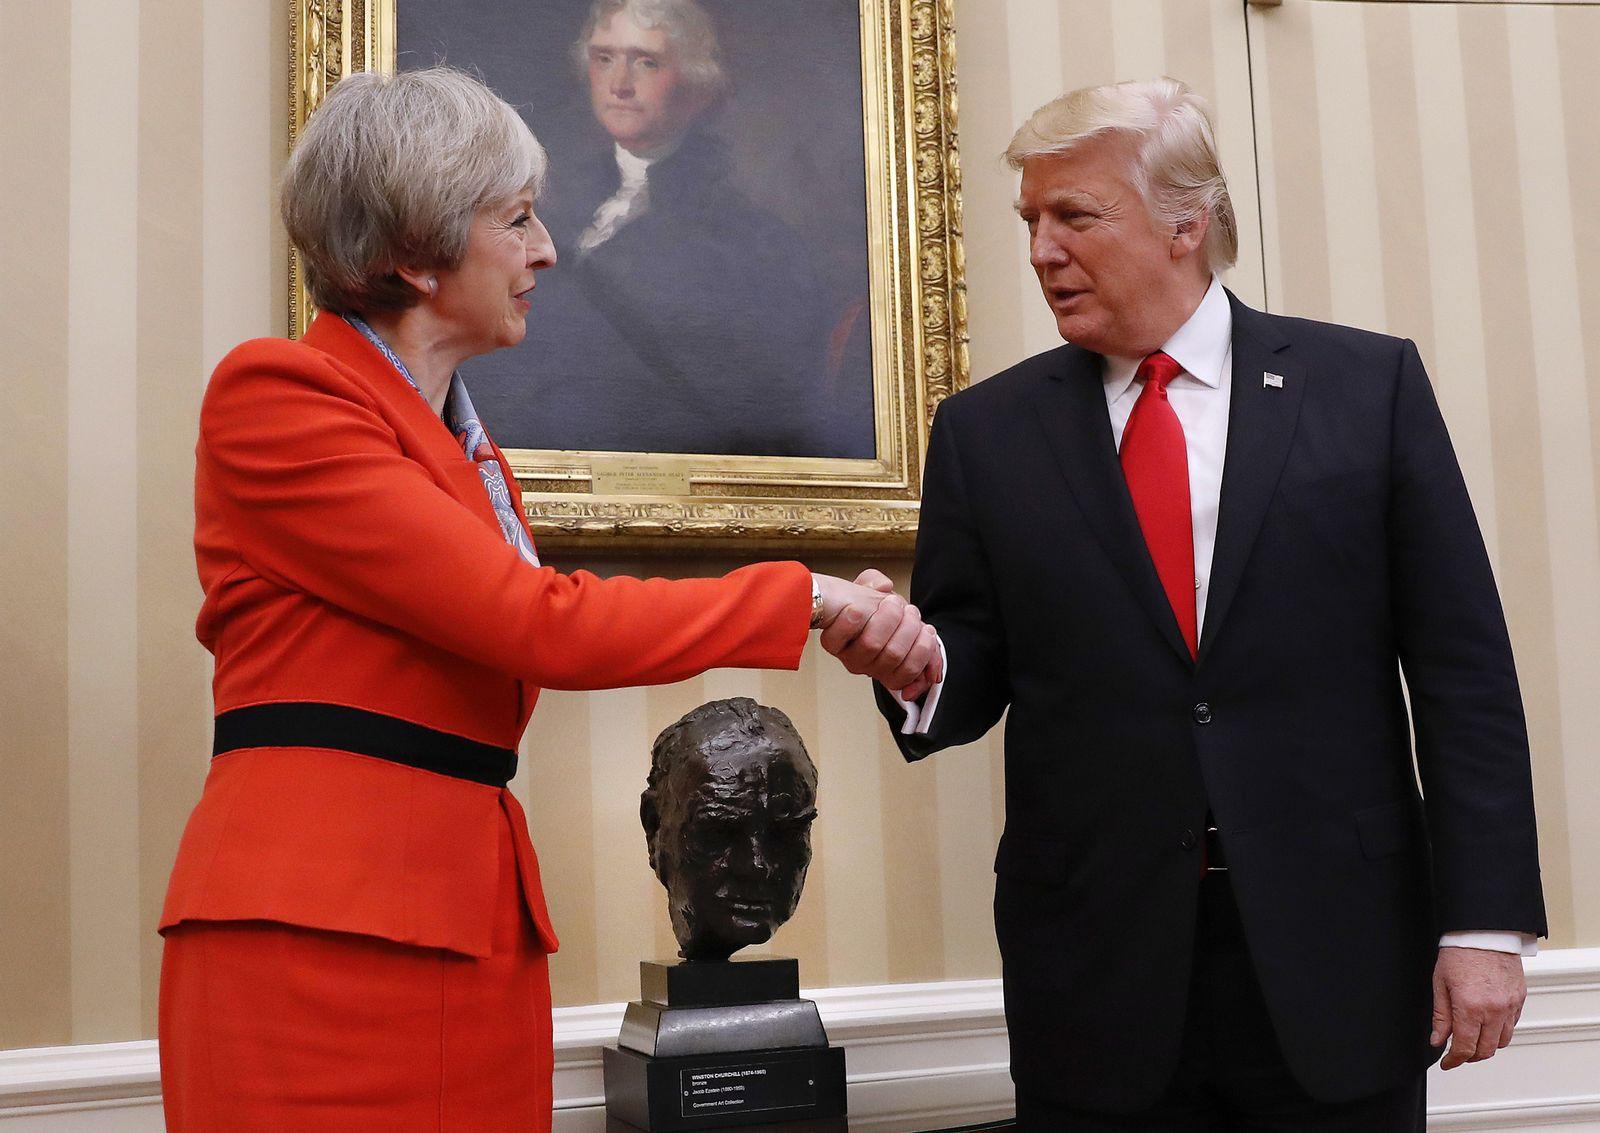 Theresa May / Donald Trump / Handshake